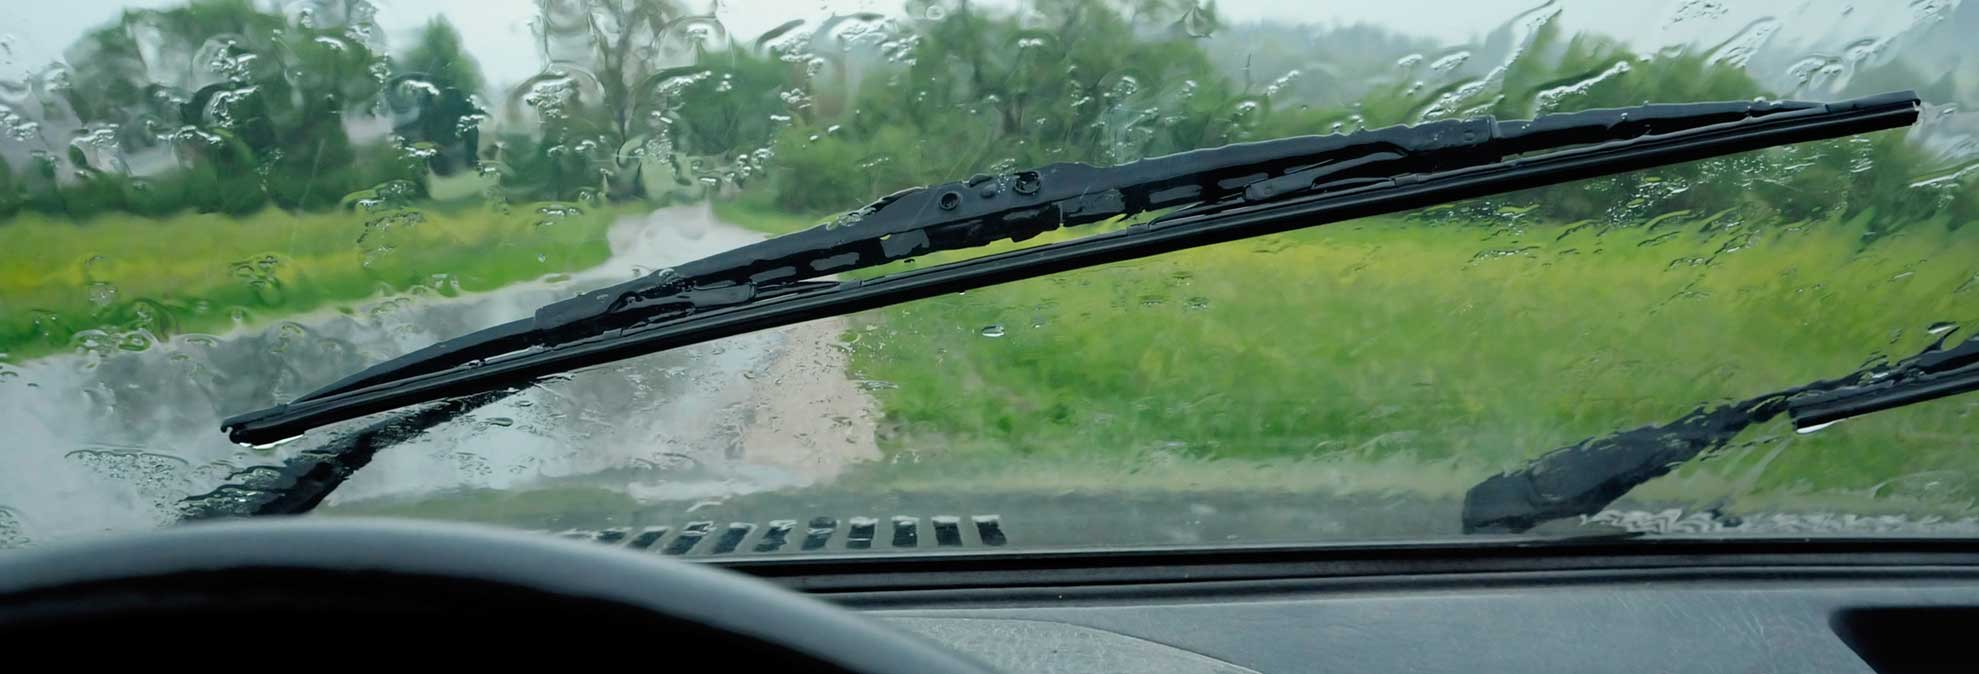 14 Car Flat U-type Frameless Rubber Windshield Windscreen Flat Wiper Blades R Flat Wiper Blade SODIAL